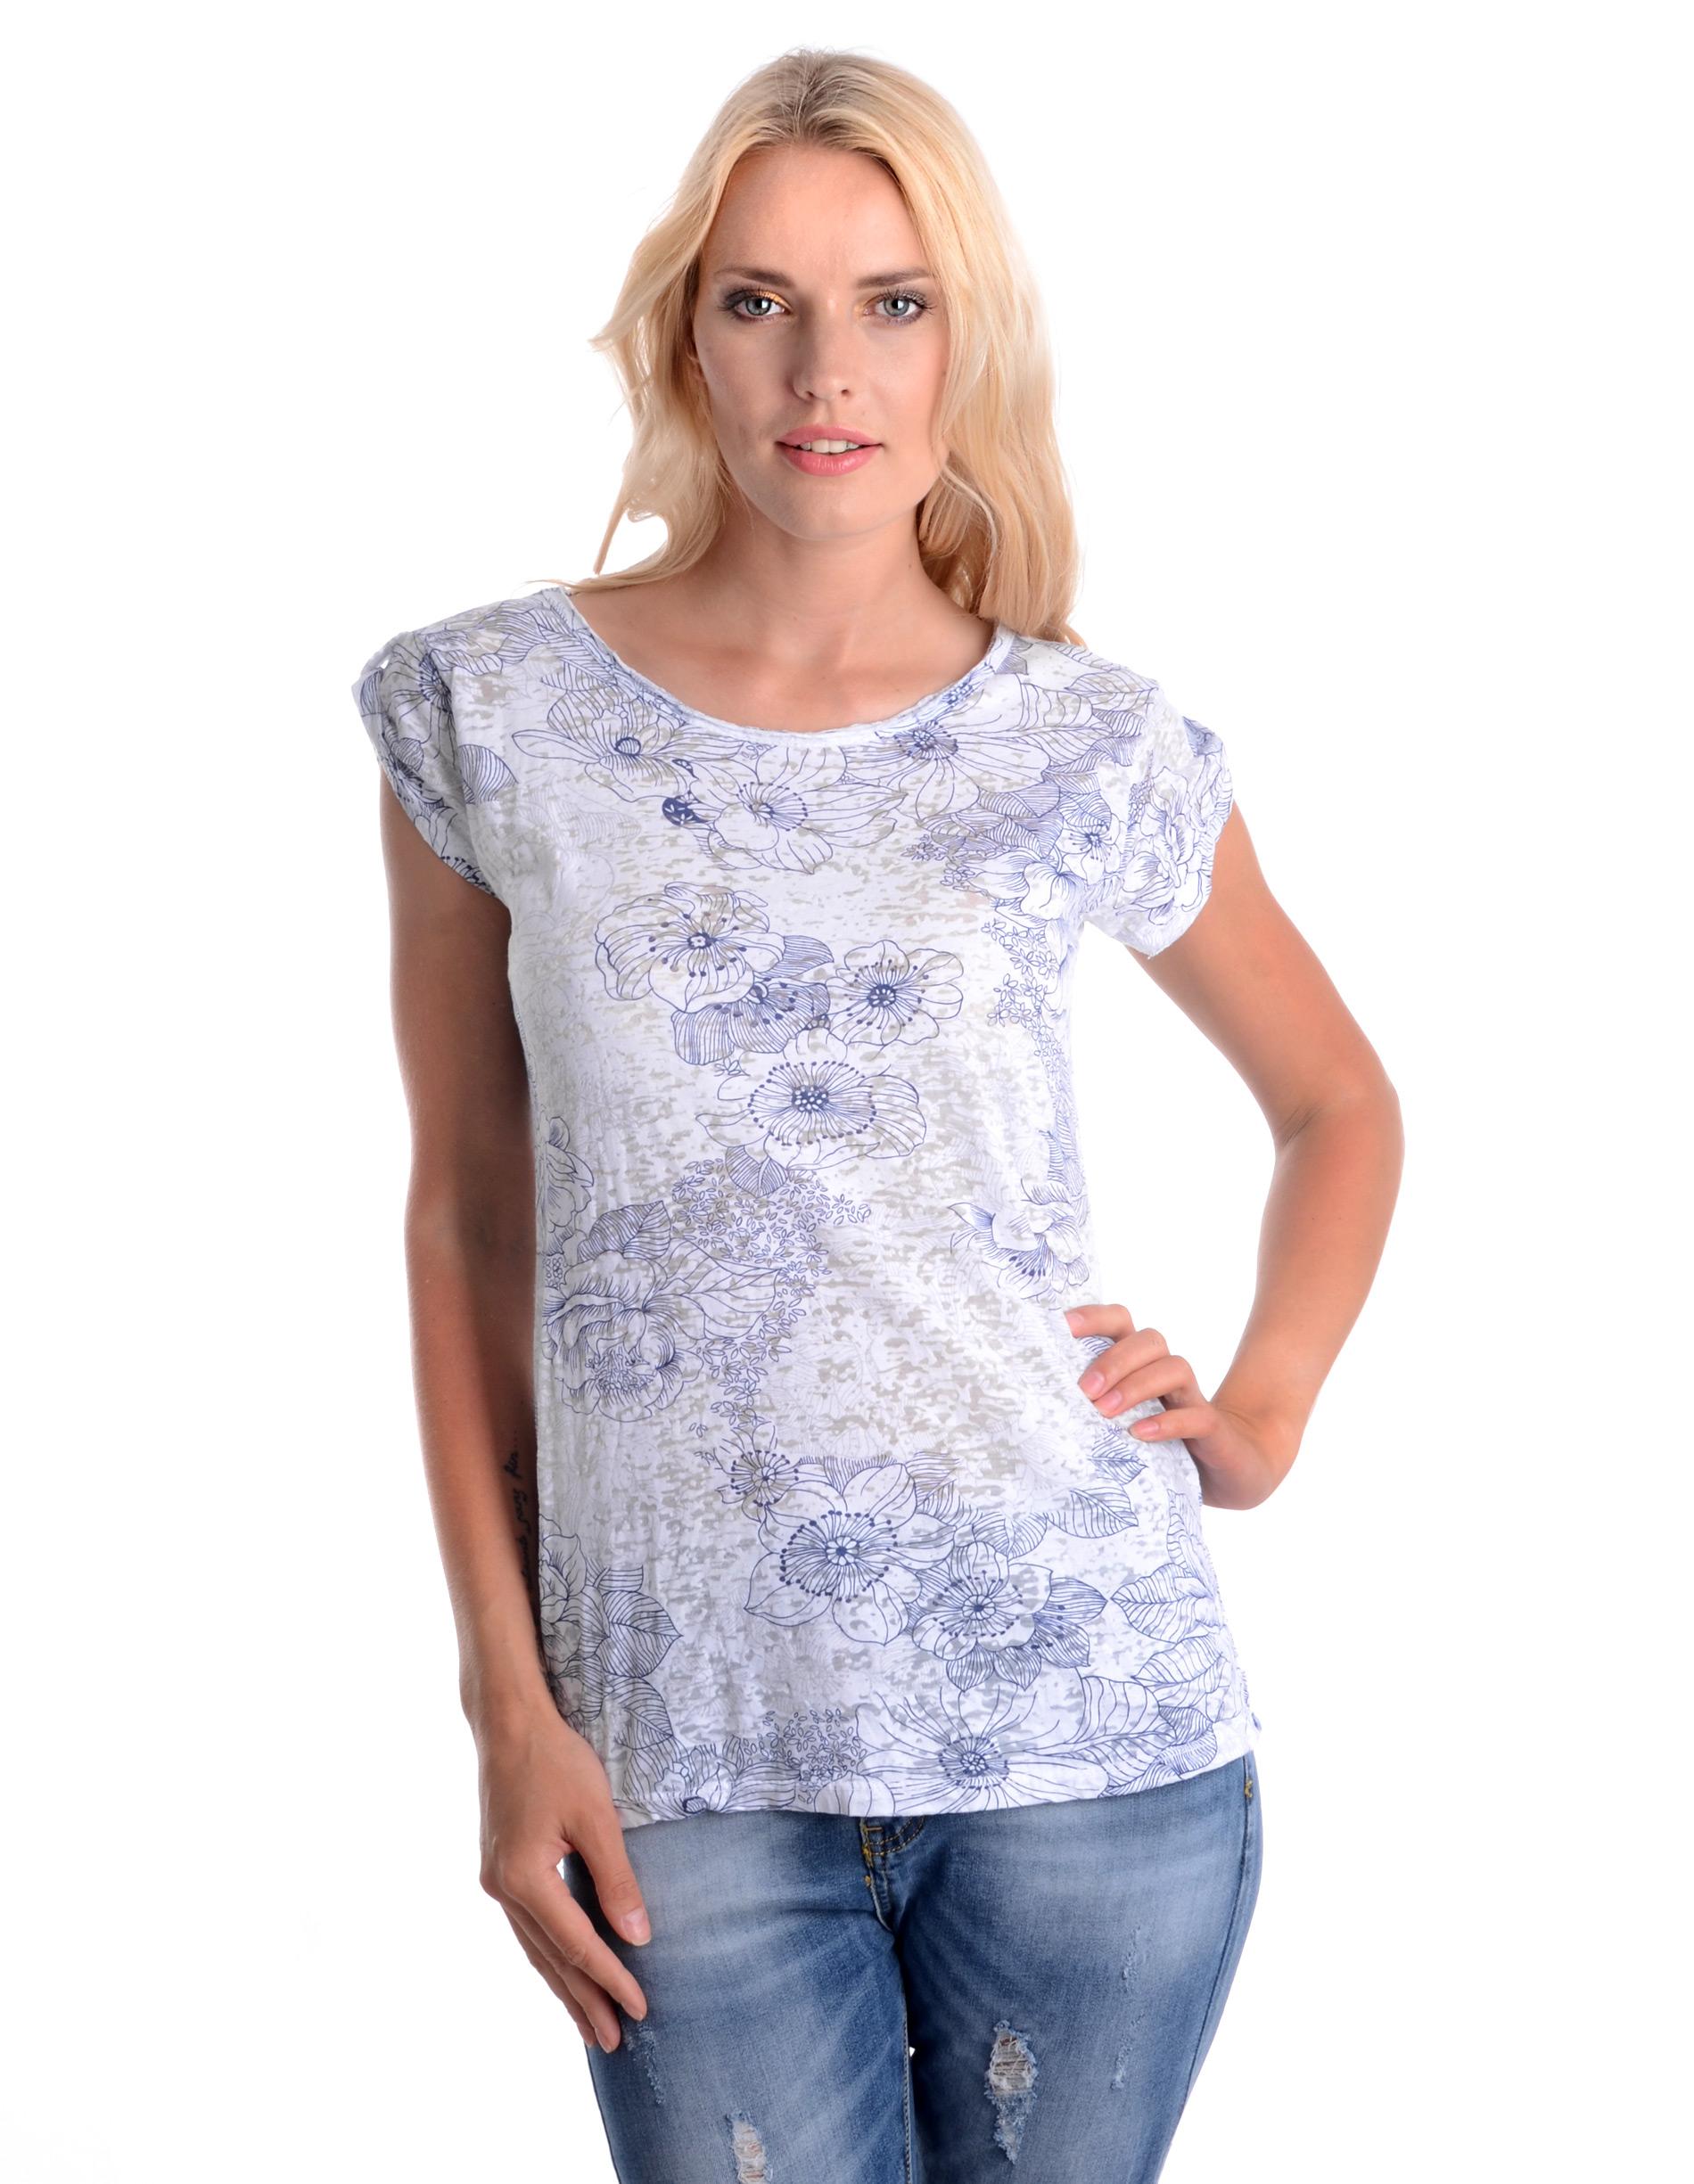 Bluzka - t-shirt - 120-6277 BIAN - Unisono